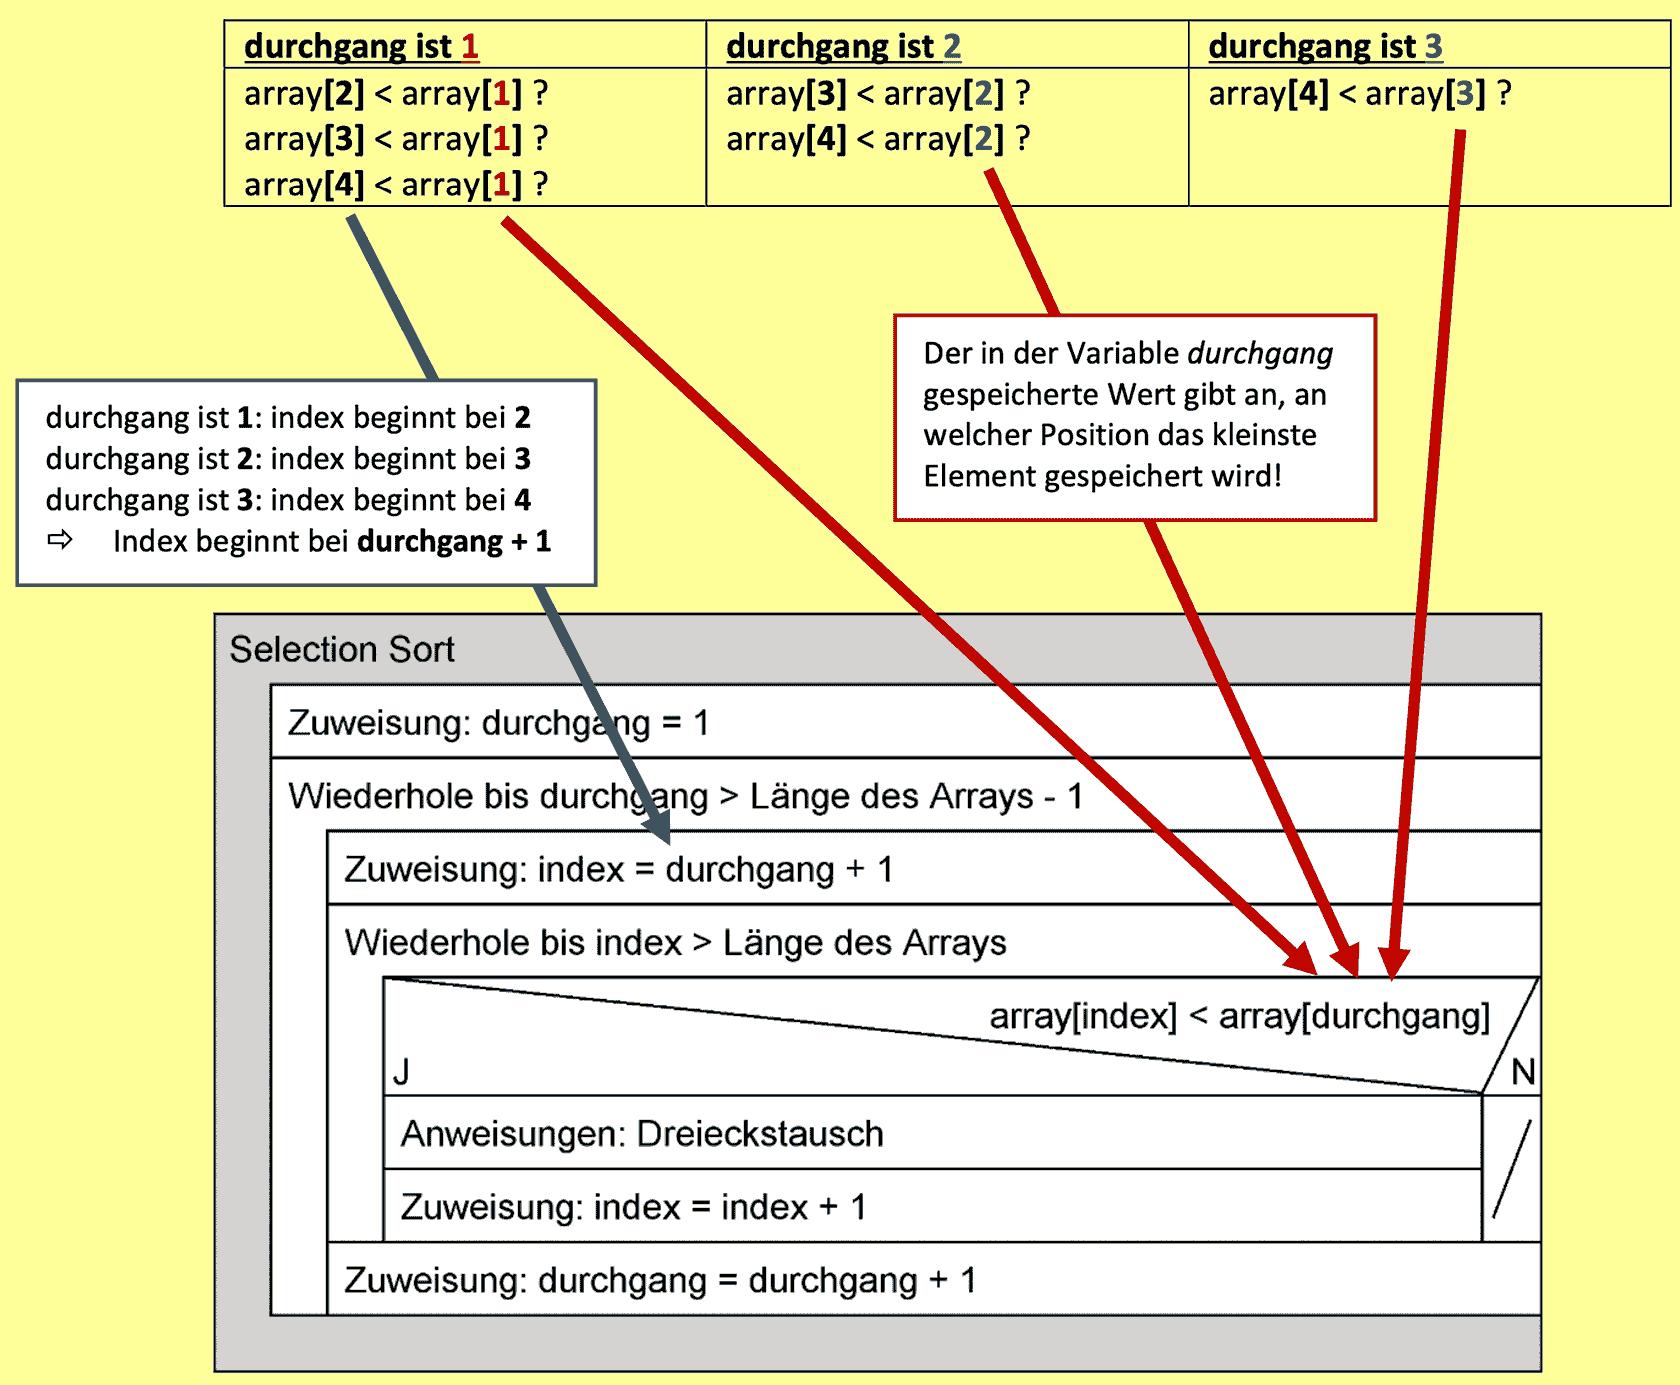 Struktogramm Selectionsort FERTIG mit Herleitung